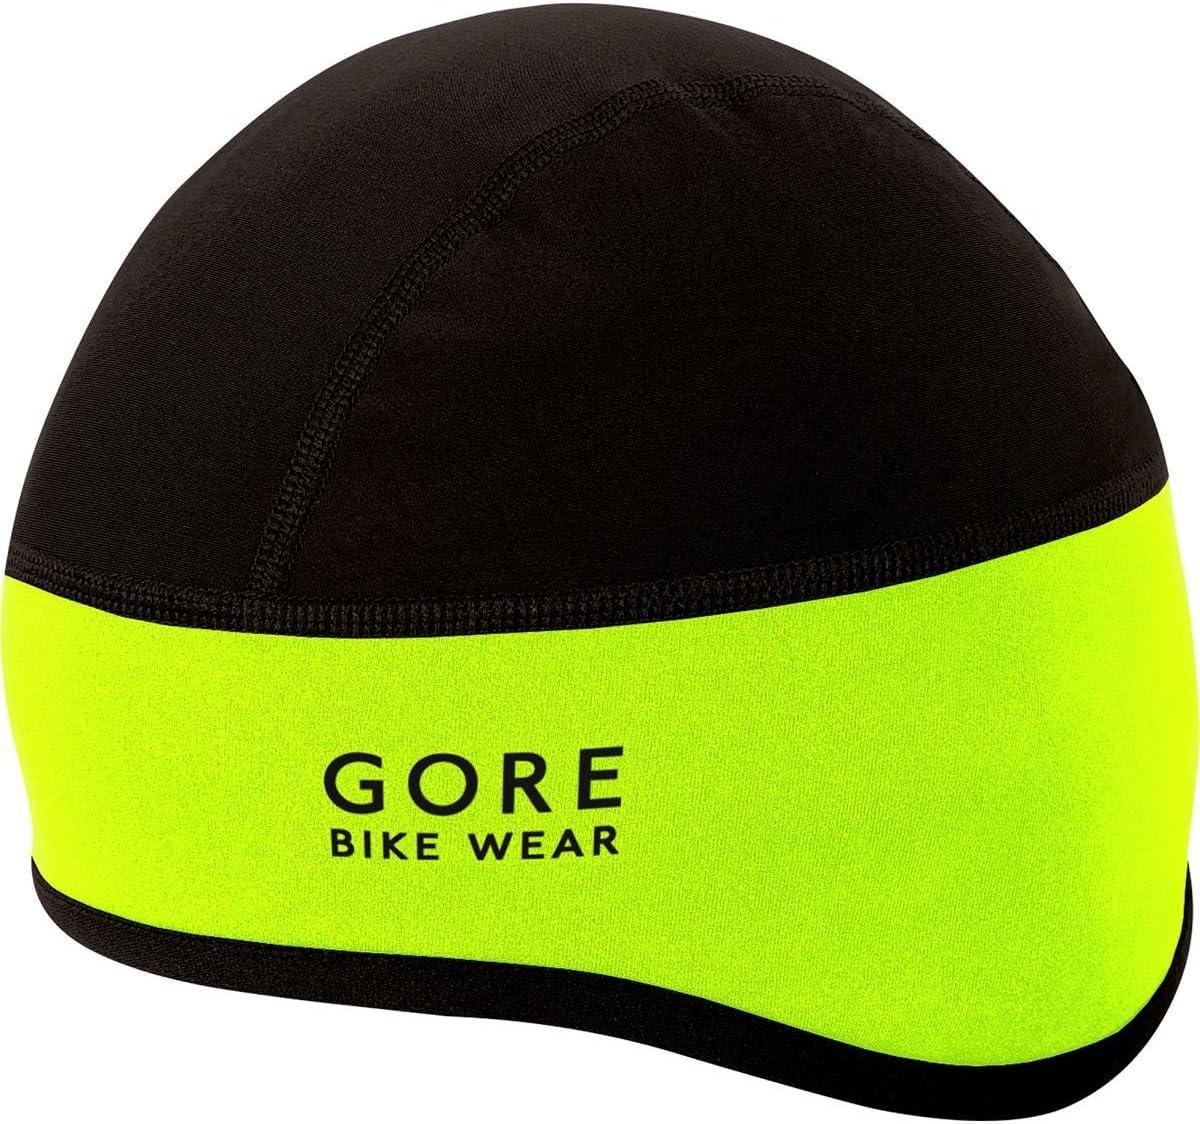 GORE BIKE WEAR Gorro ciclismo, GORE WINDSTOPPER, UNIVERSAL Helmet ...